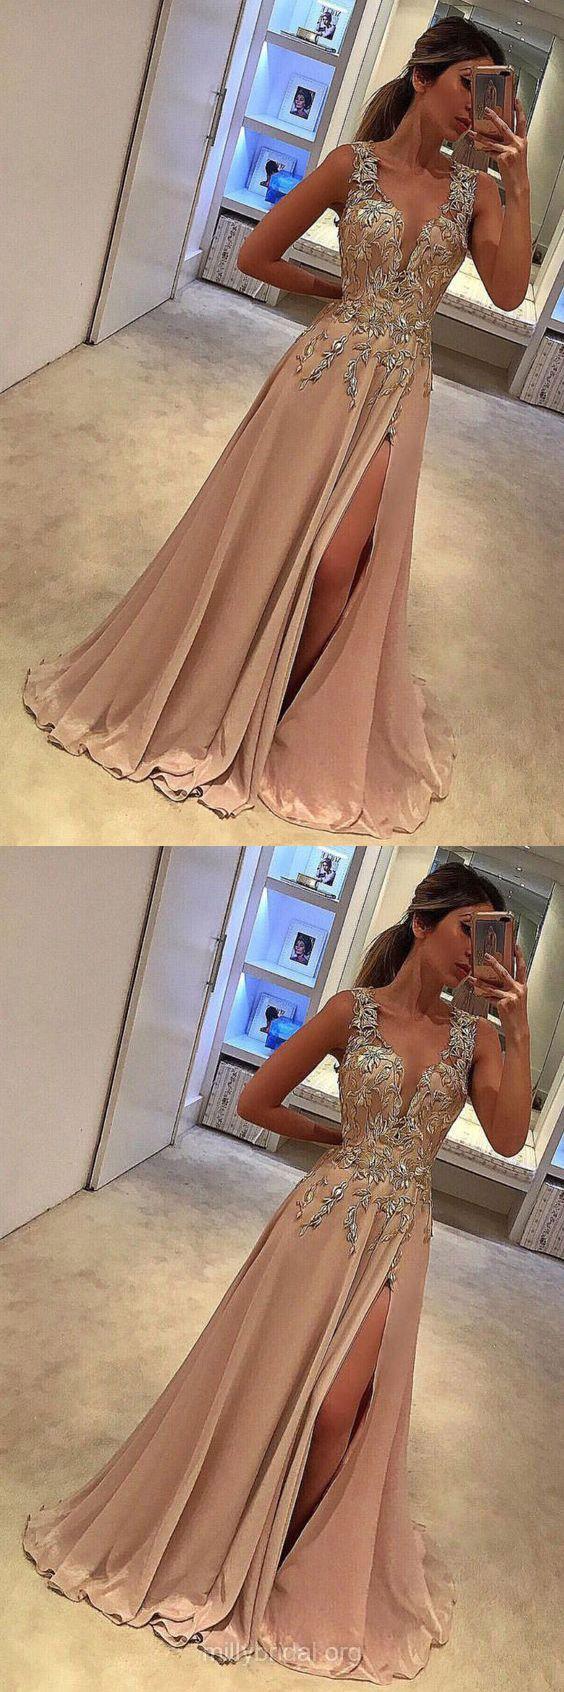 Champagne Prom Dresses, Lace Prom Dresses, Long Prom Dresses 2018, A-line Prom Dresses For Teens, V-neck Prom Dresses Chiffon